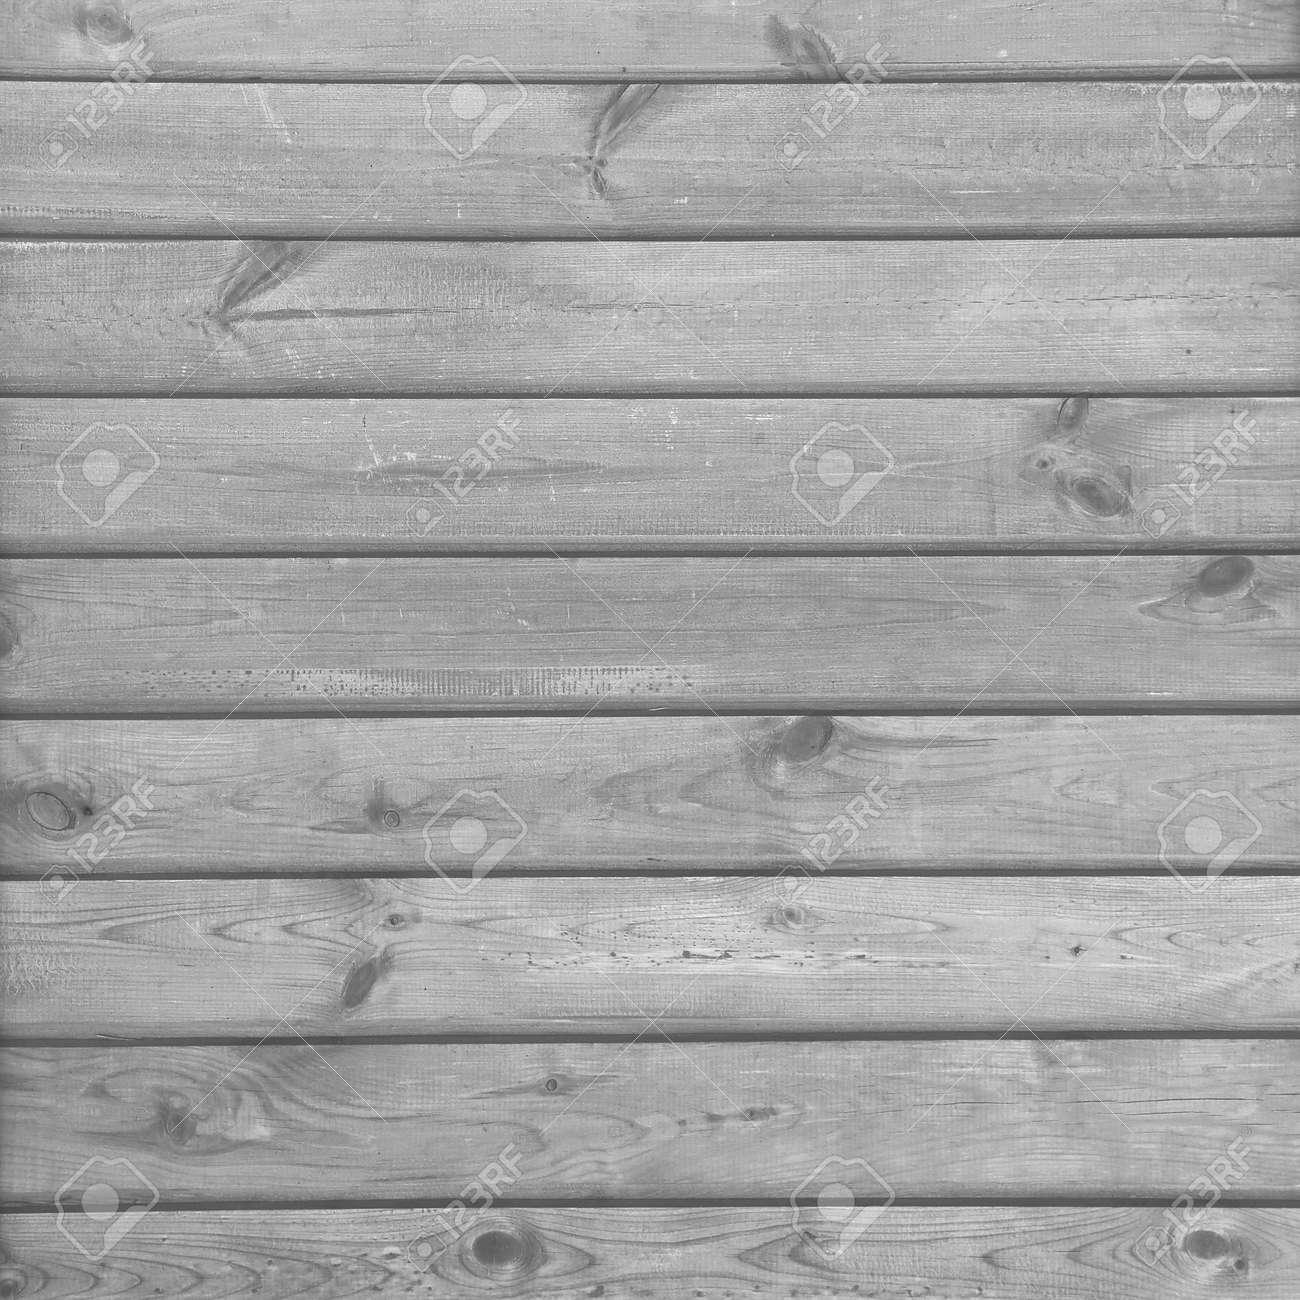 wood wall texture grey background old tiles floor Stock Photo - 23729979